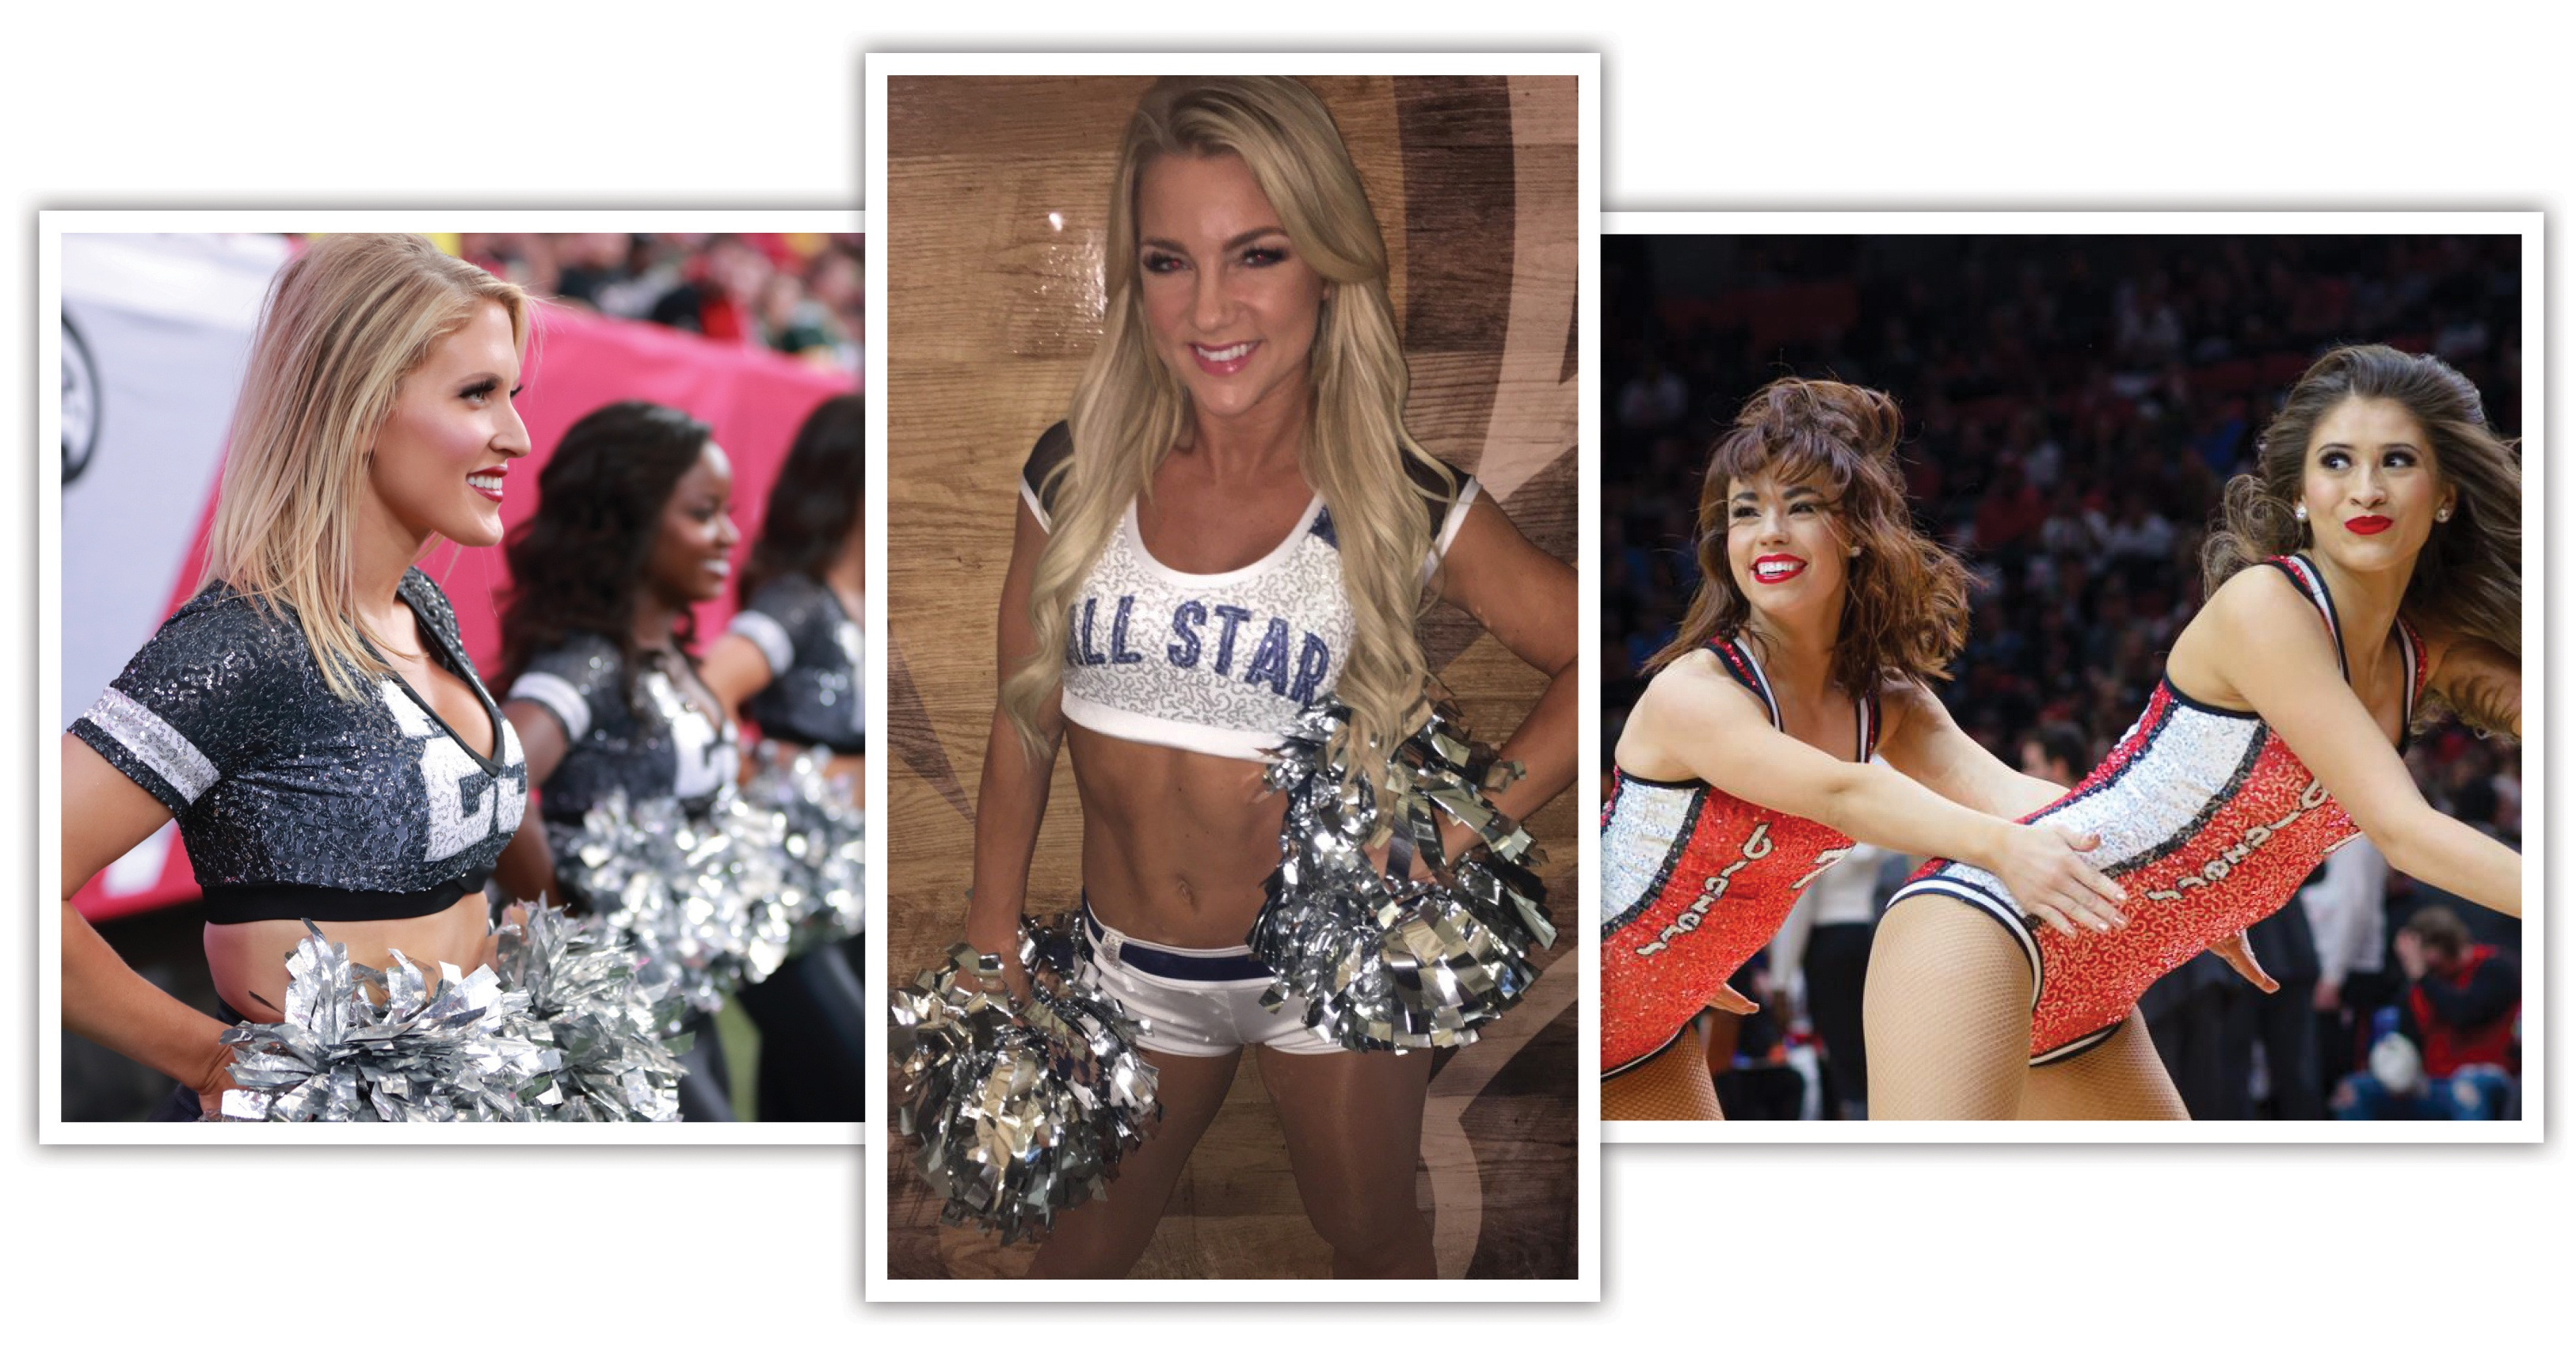 cheer and pom uniform trends: sequin jersey